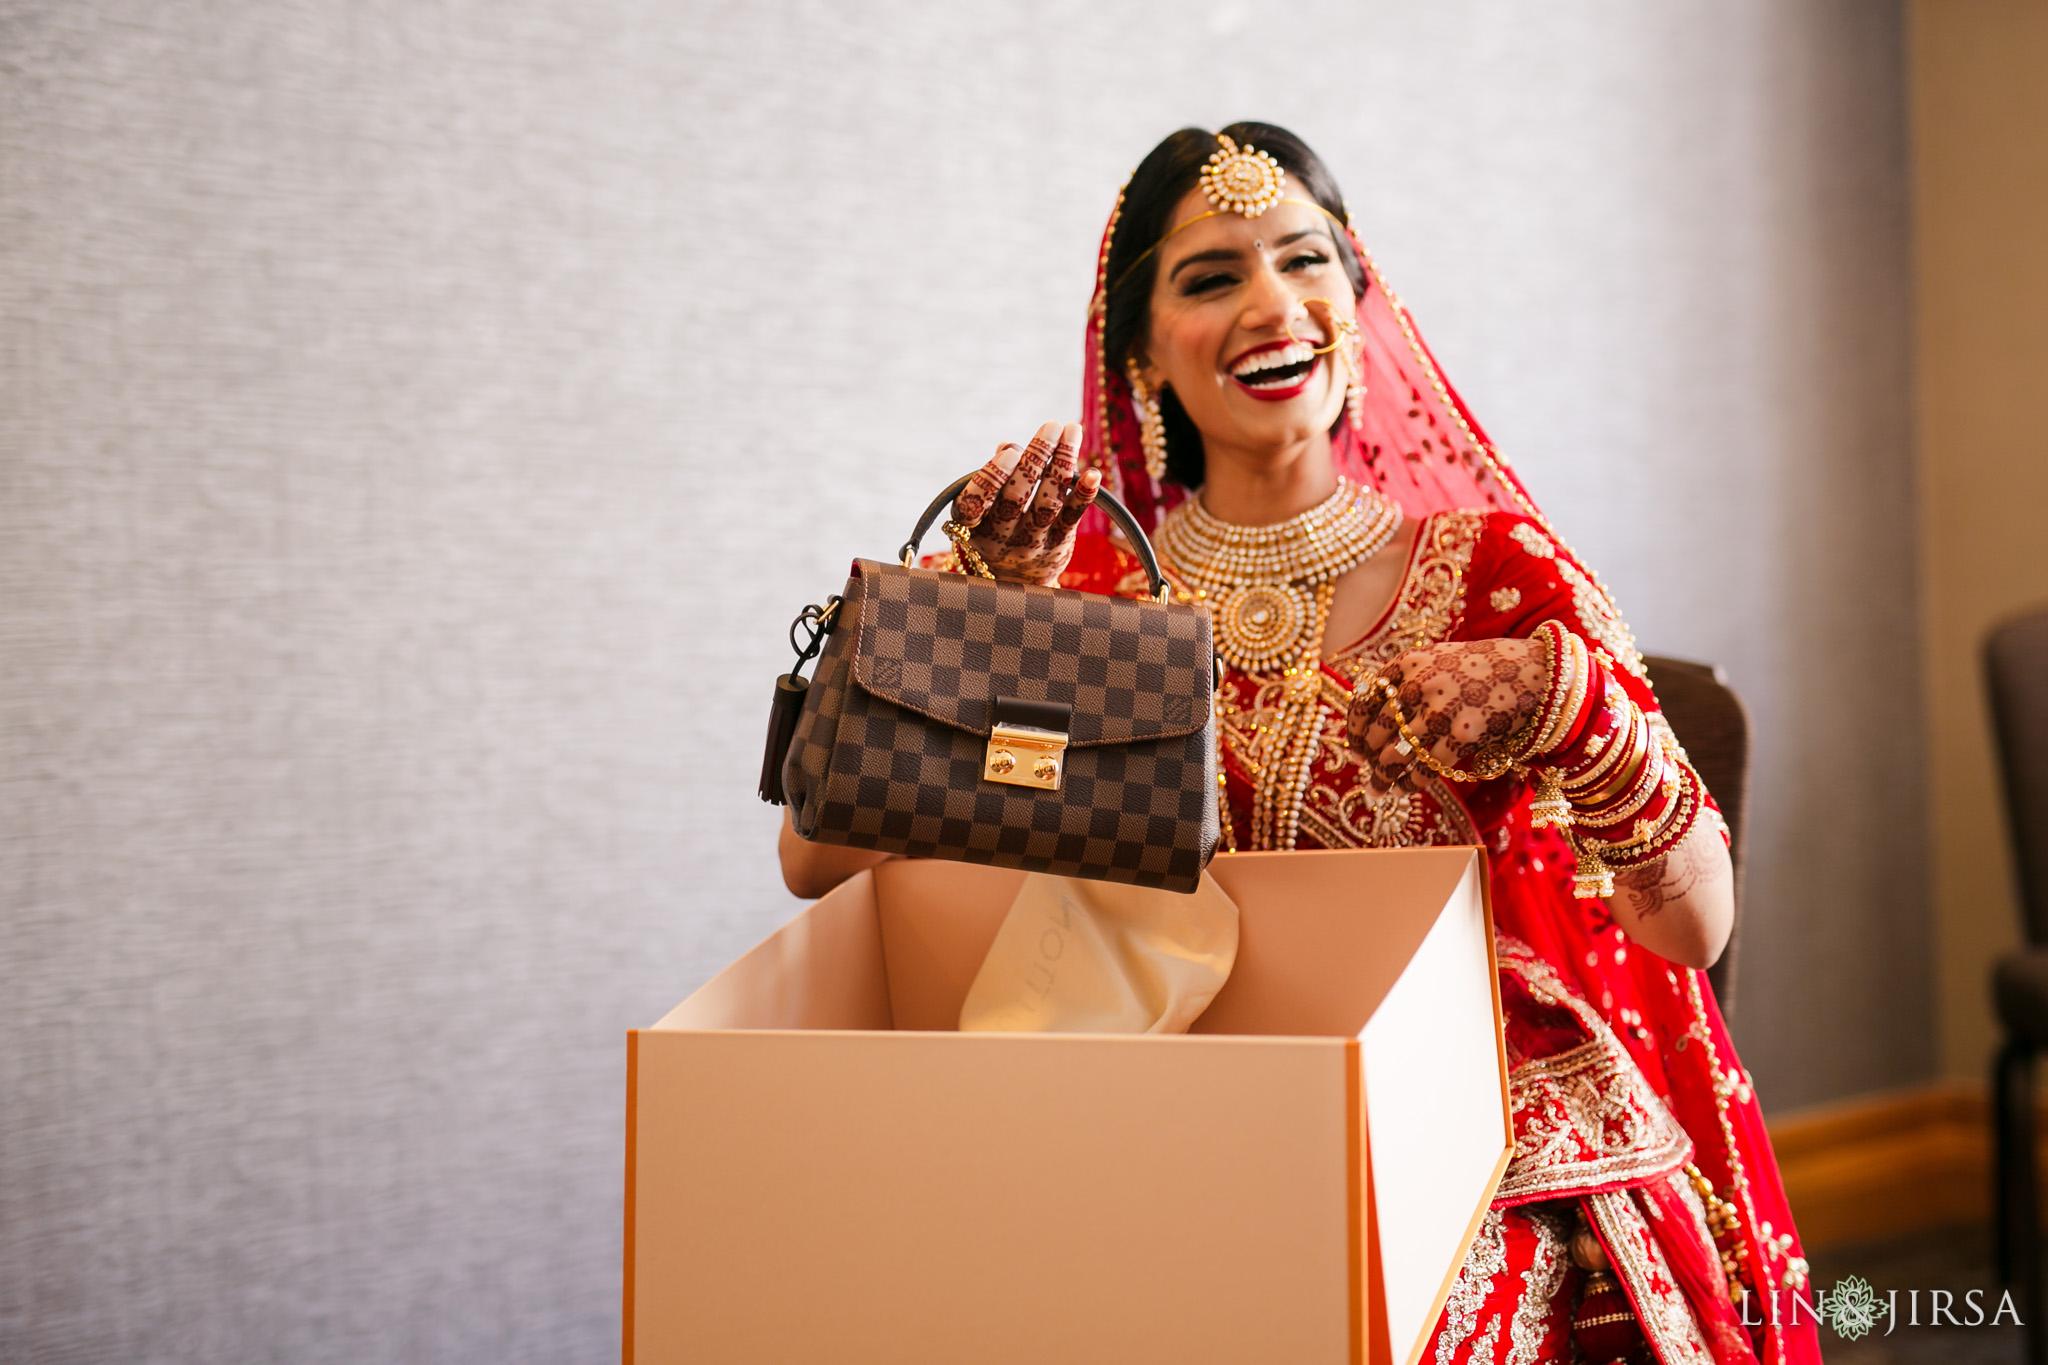 003 san jose marriott indian wedding photography